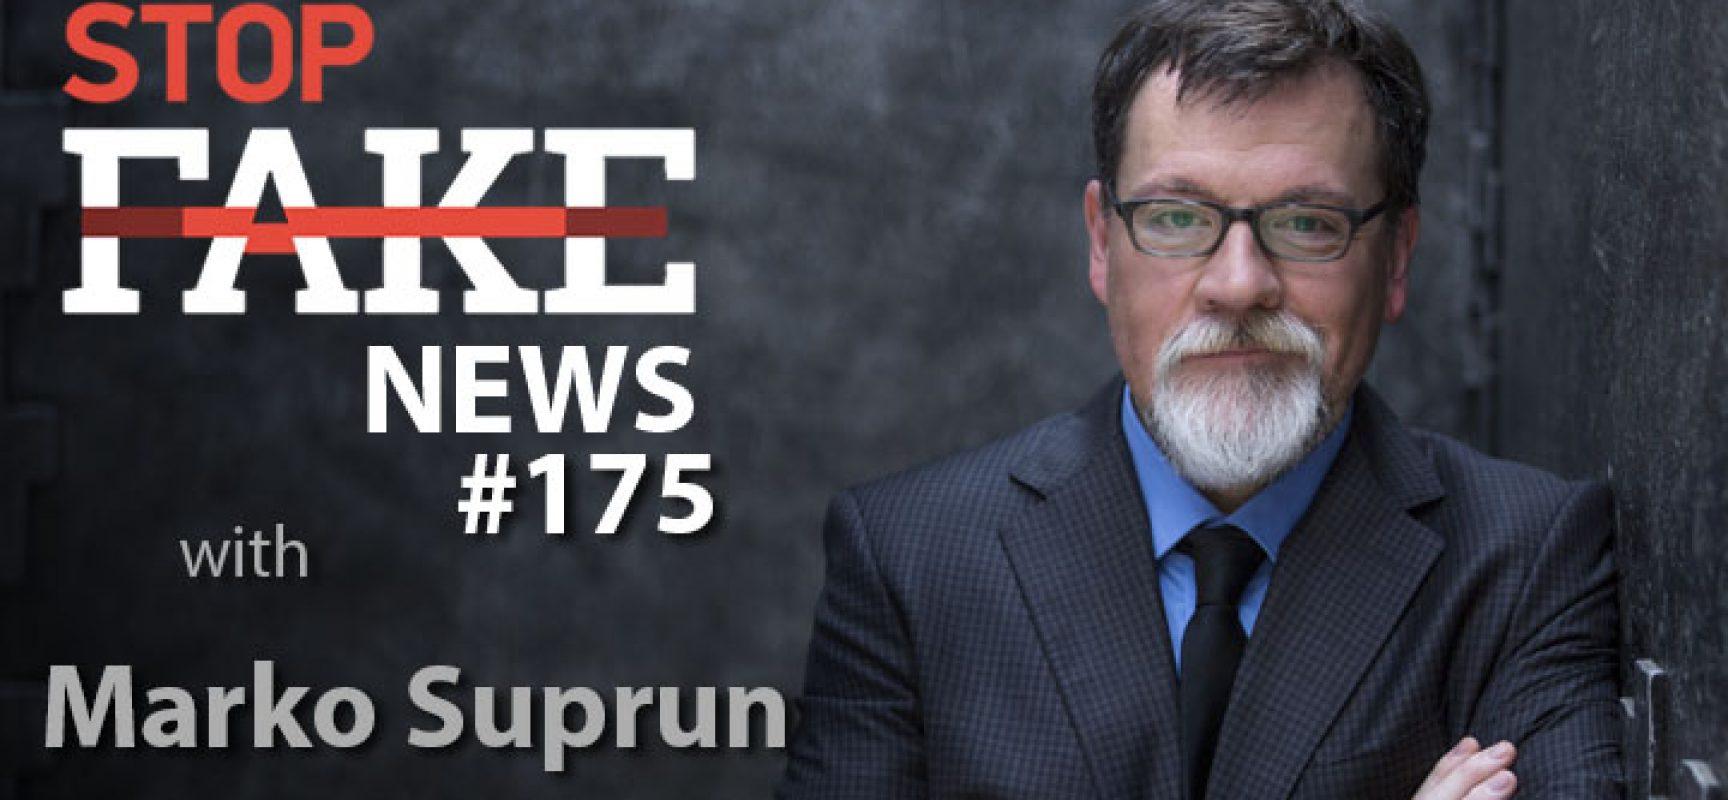 StopFake #175 con Marko Suprun